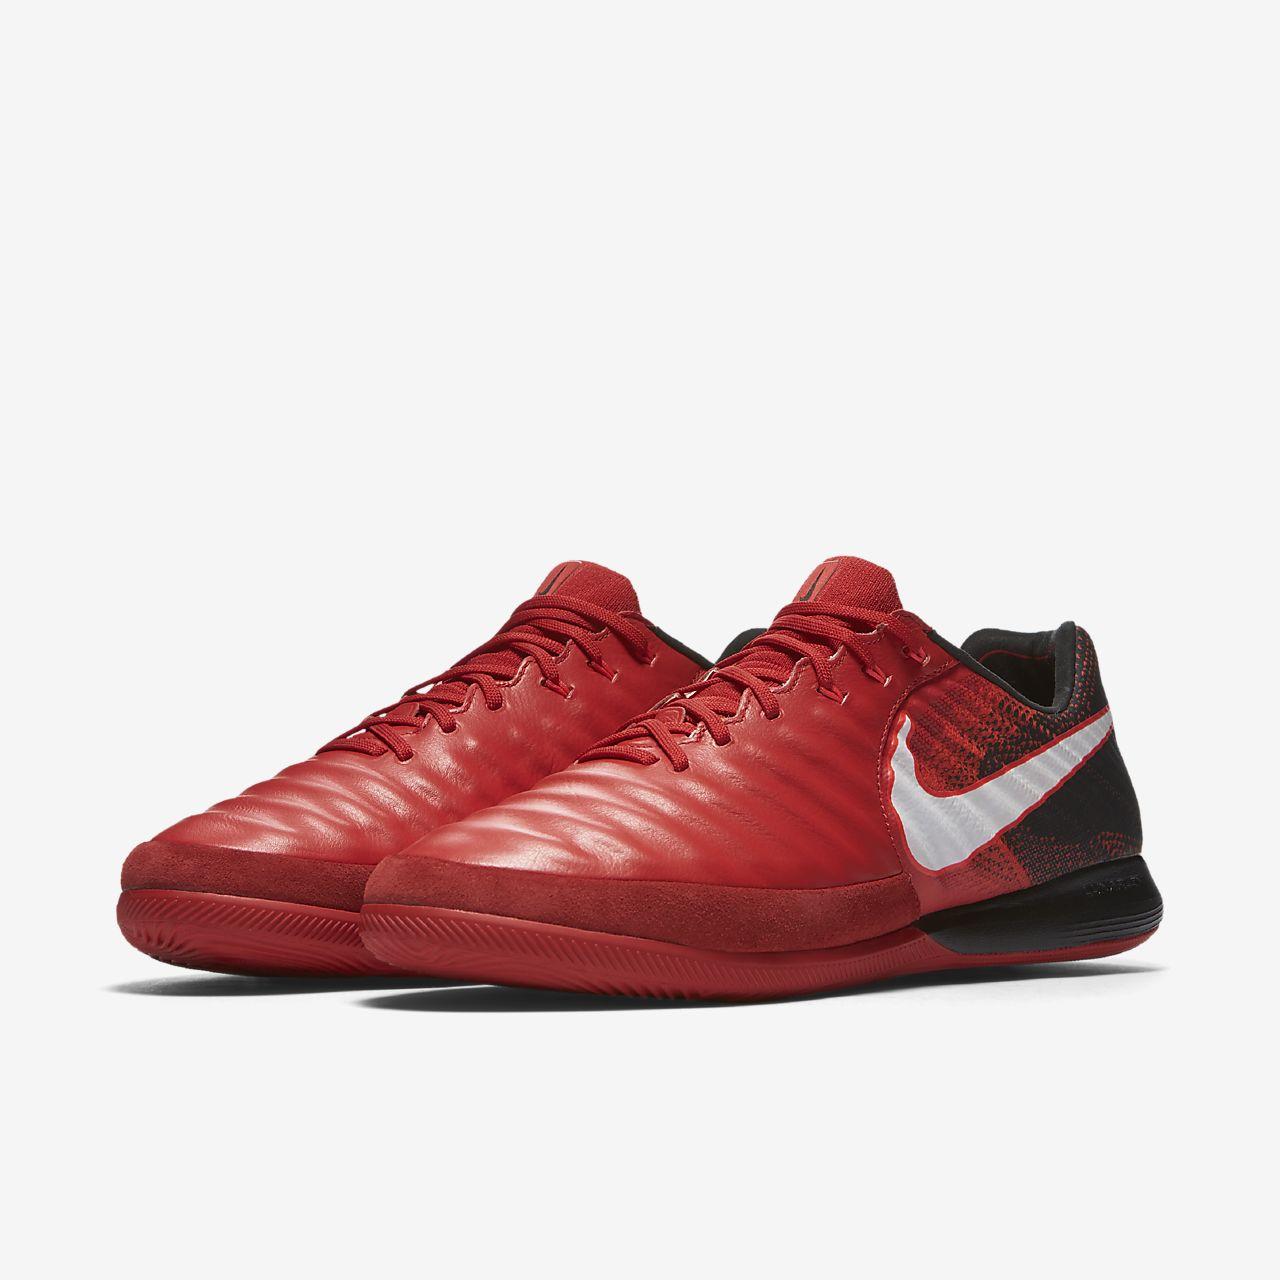 02e423357d9 nike tiempox proximo ic summit white university red black  nike tiempox  proximo ii indoor court football shoe